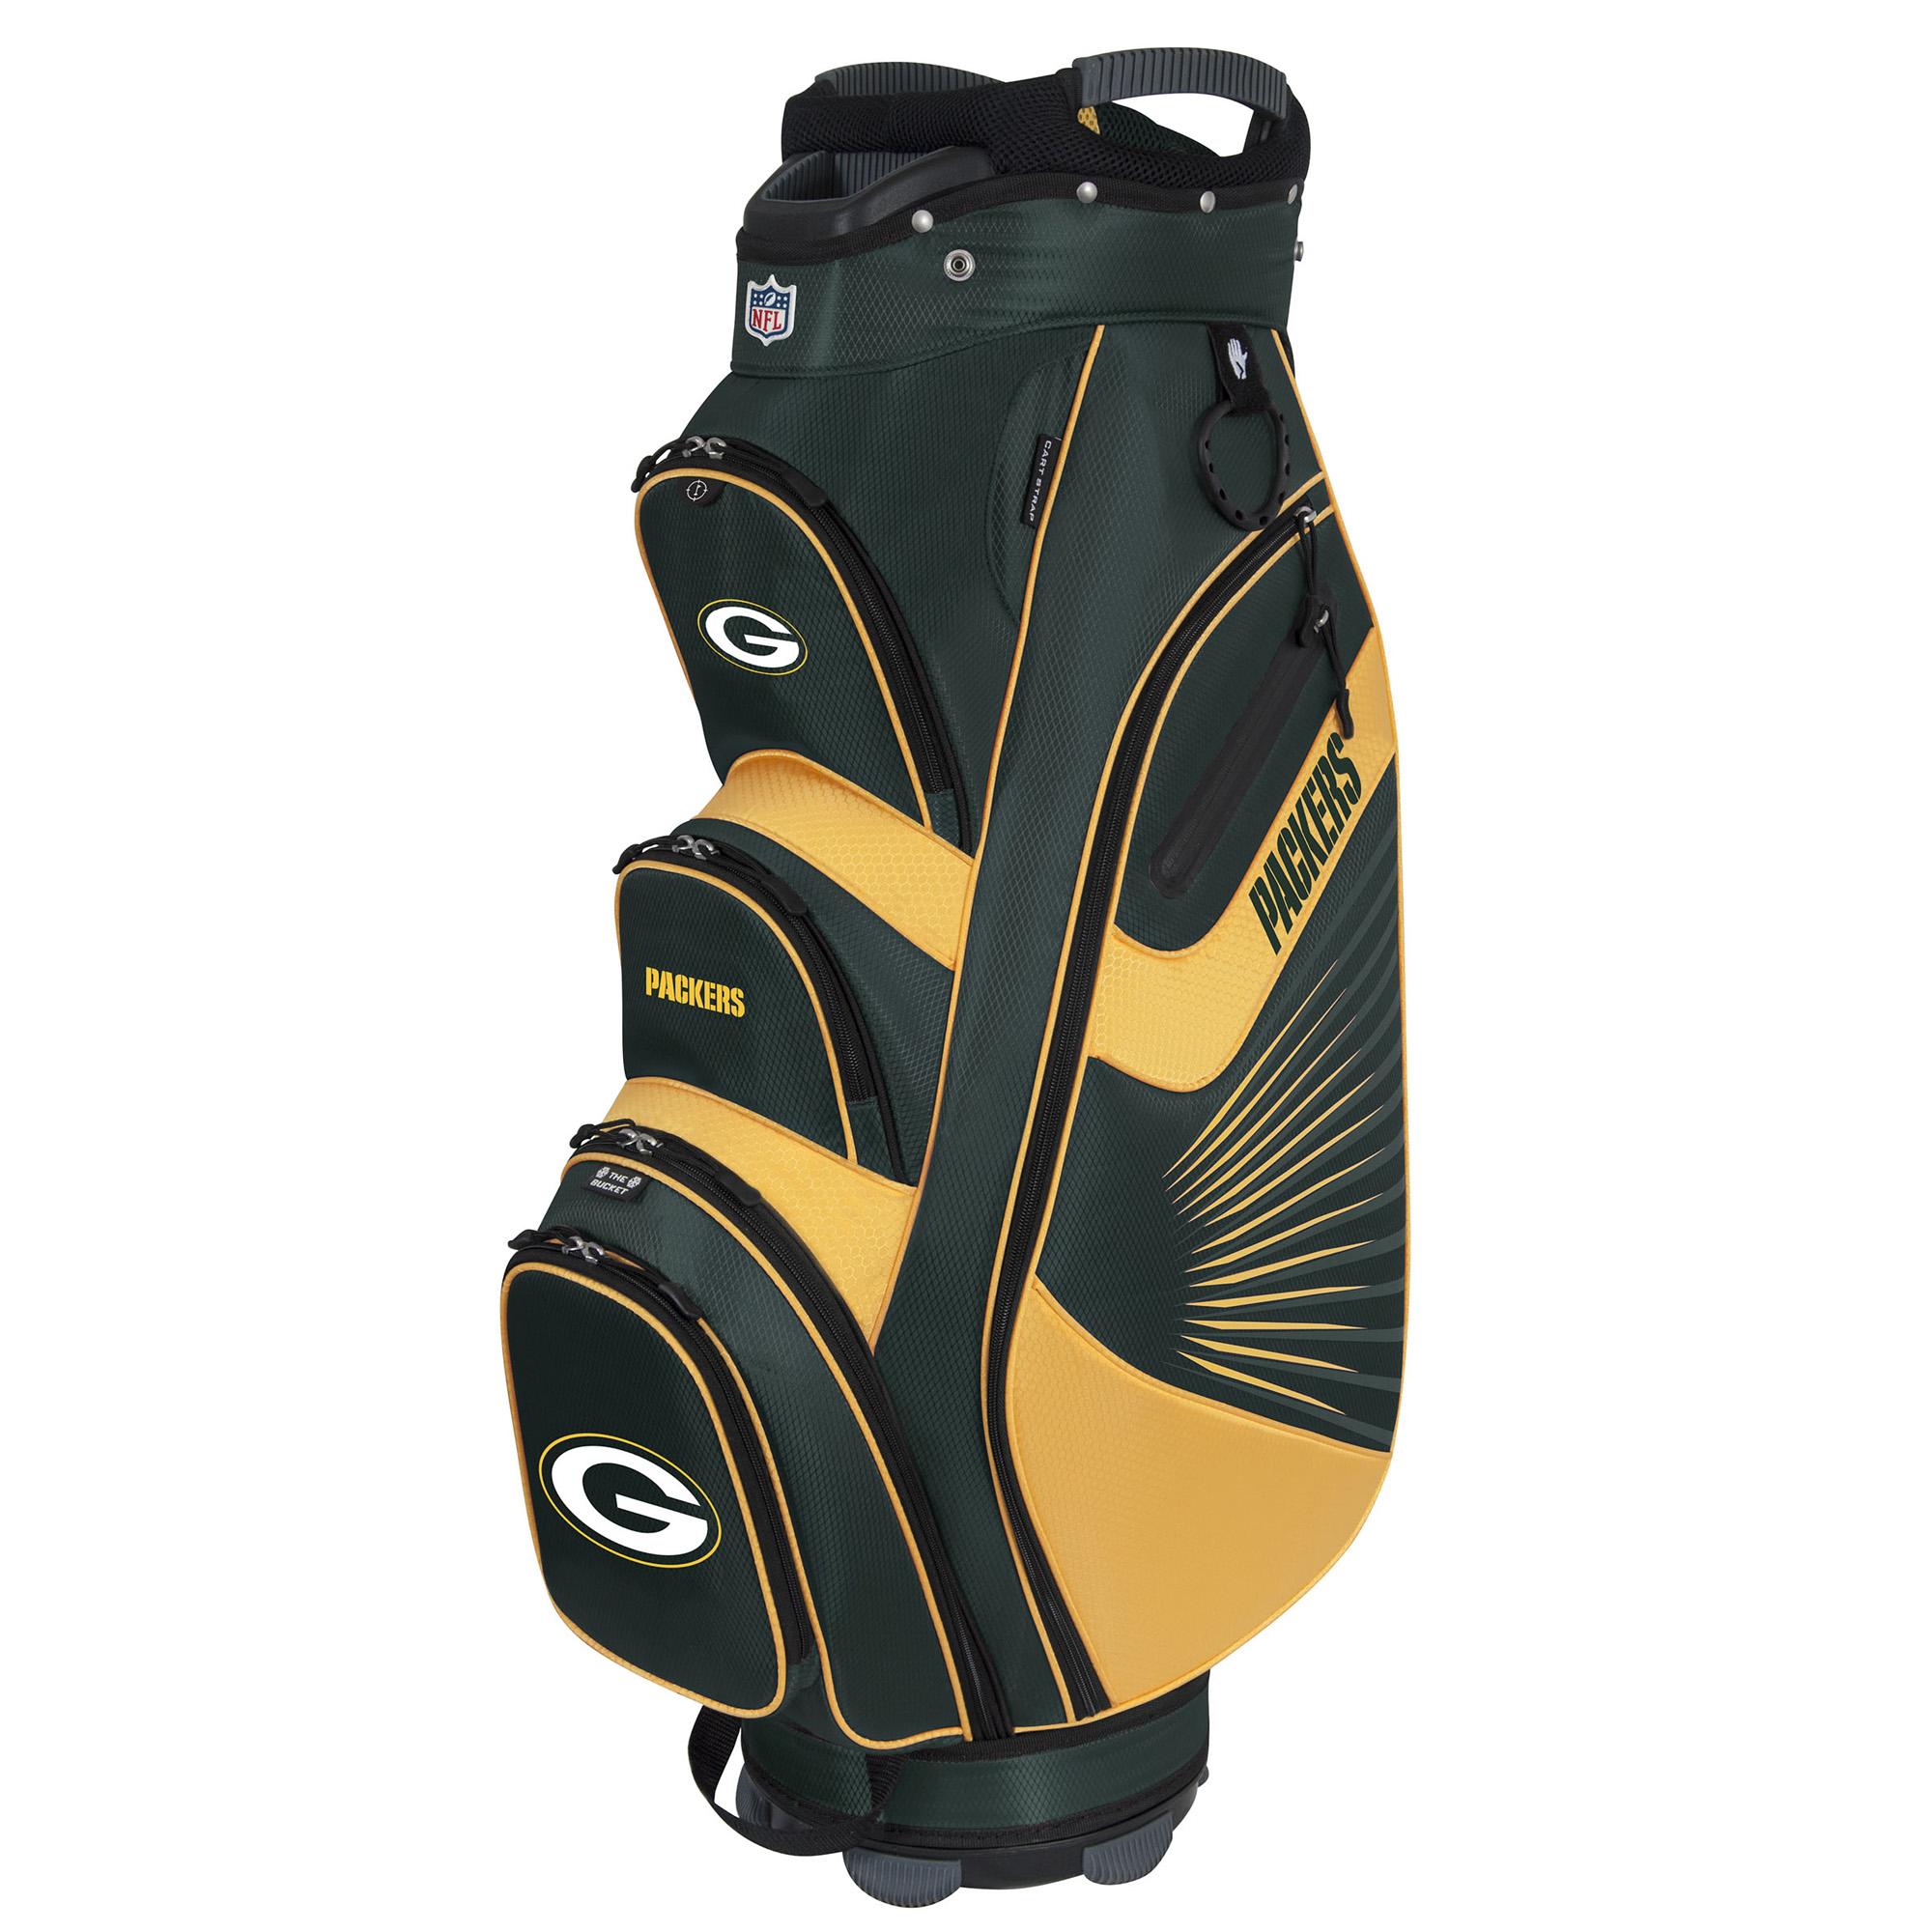 Green Bay Packers The Bucket II Cooler Cart Bag - No Size